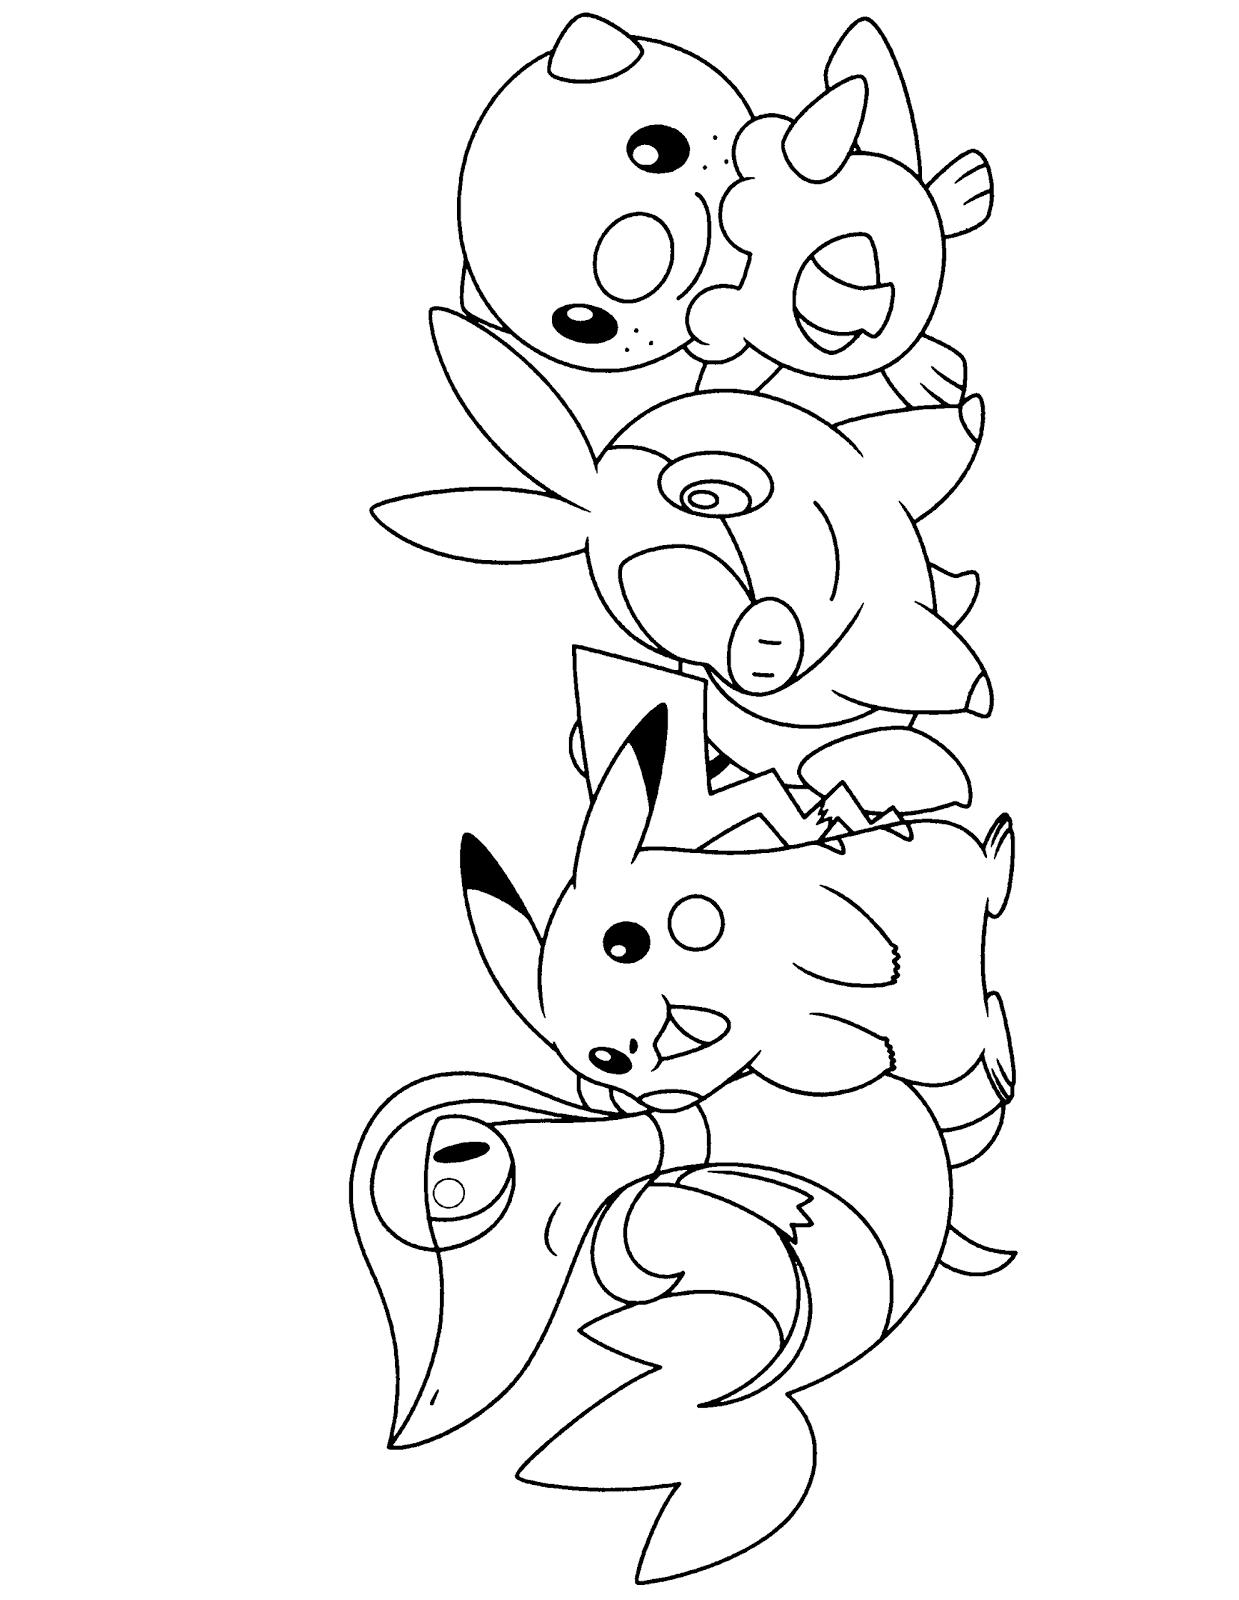 Pokemon Black And White 2 Coloring Pages Pokemon White 2 - Free...